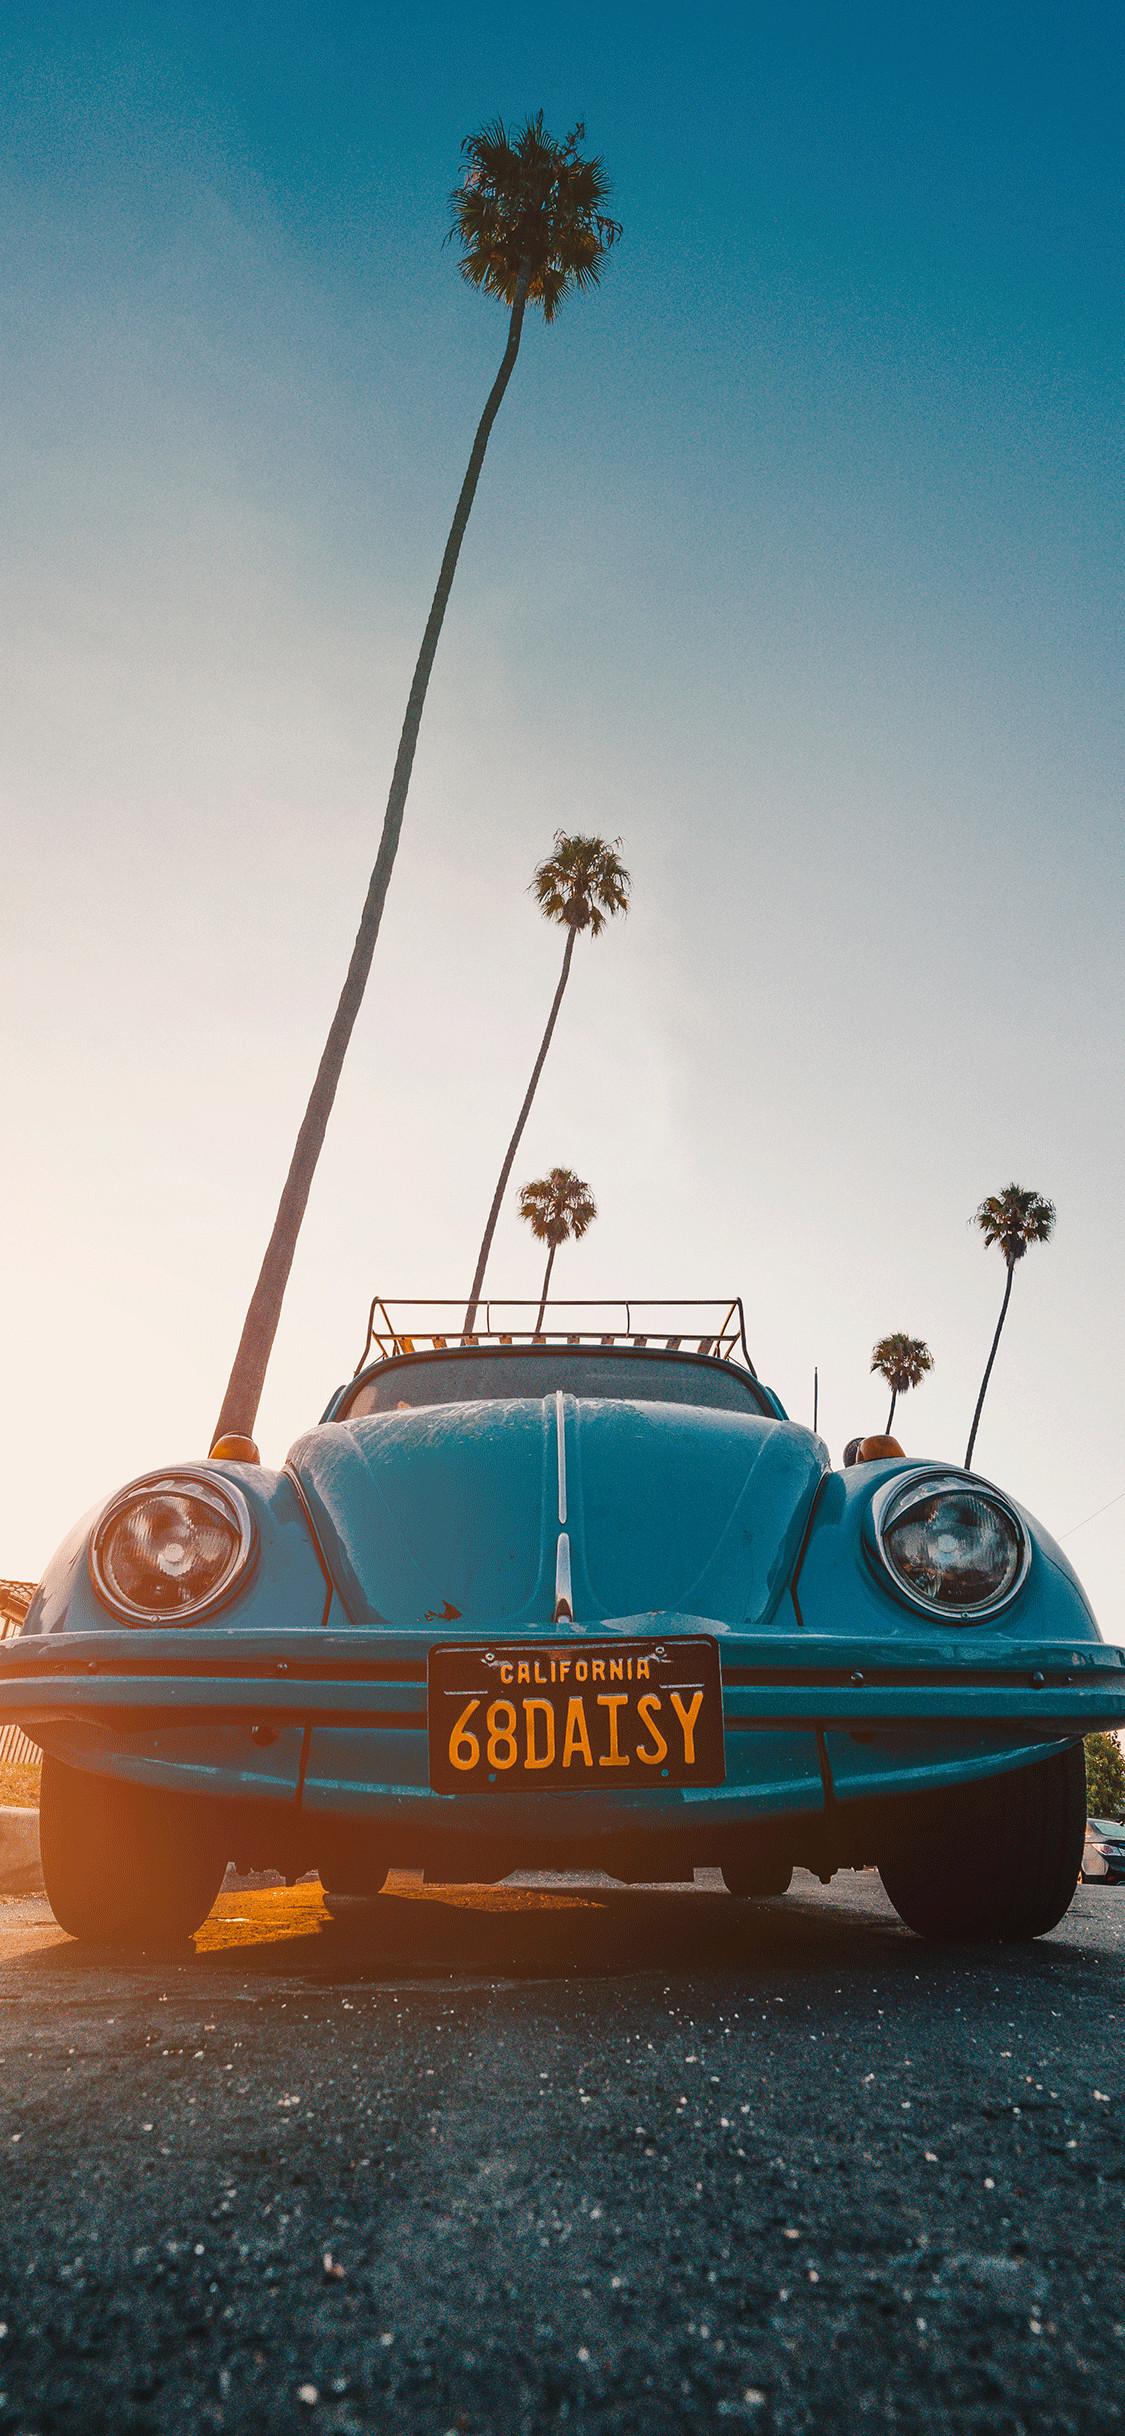 Res: 1125x2436, iPhone wallpaper car vintage volkswagen Vintage Car